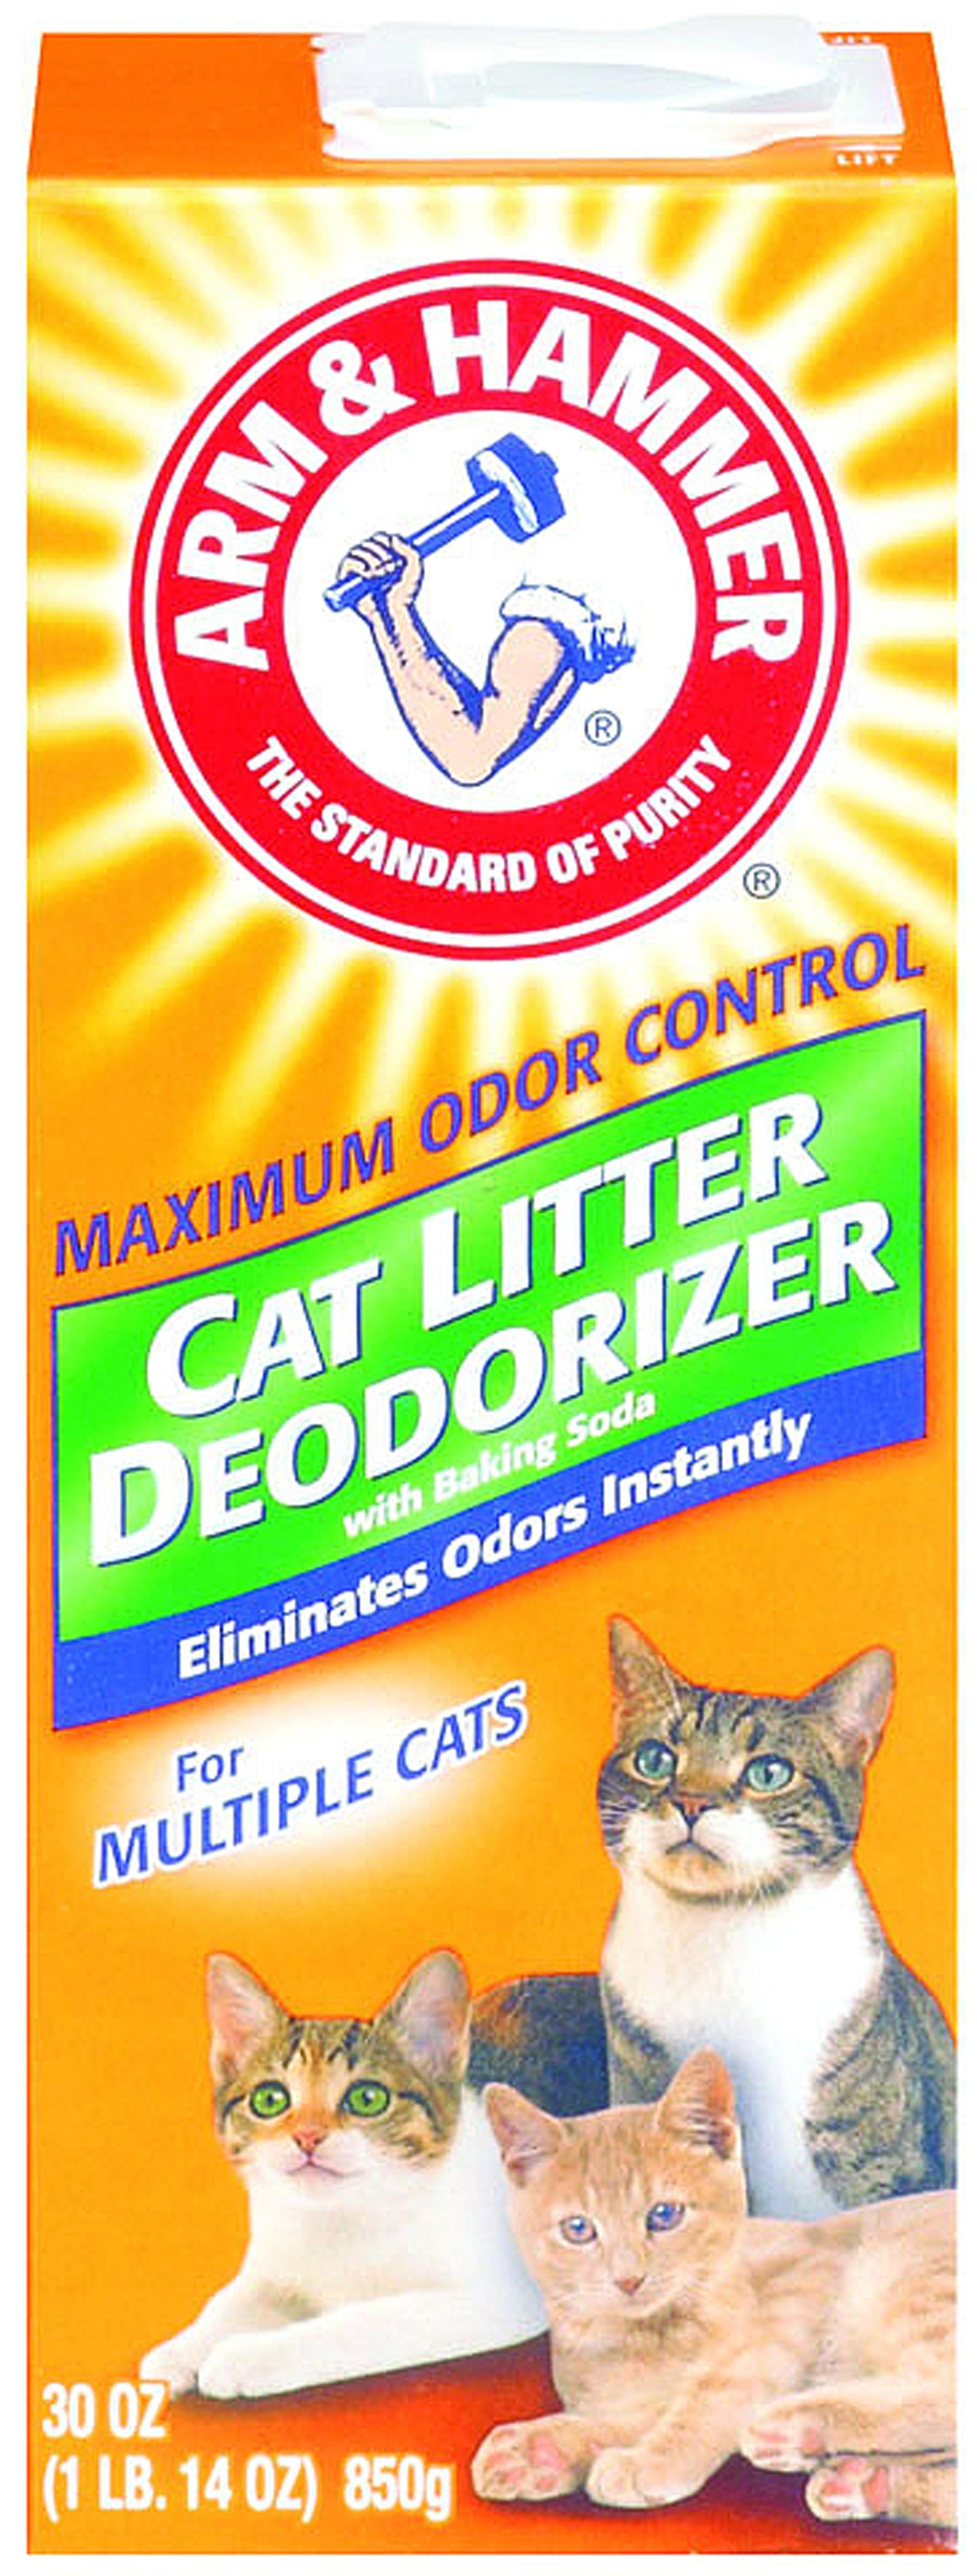 ARM & HAMMER CAT LITTER DEODORIZING POWDER